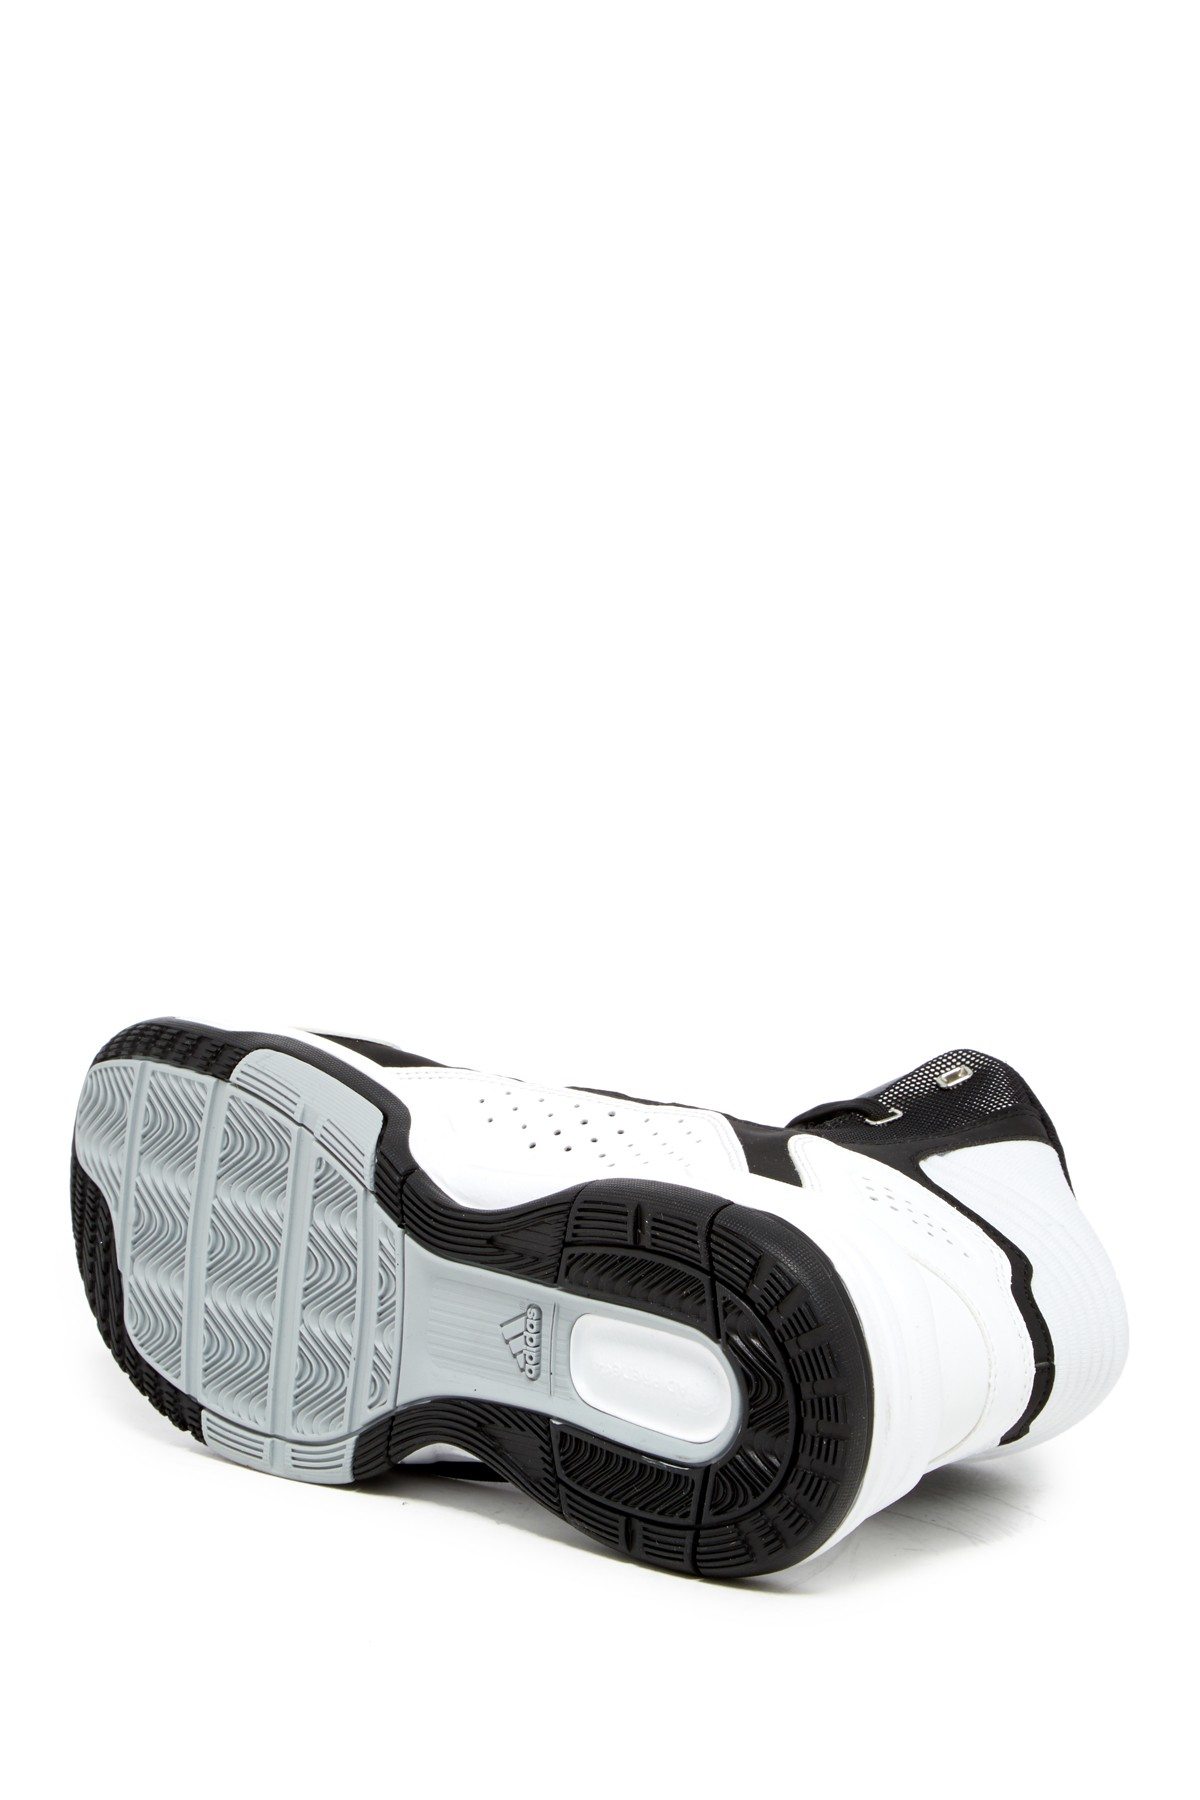 Lyst adidas Originals amplificar Basketball zapatilla en negro para hombres hombres hombres 81aa7f